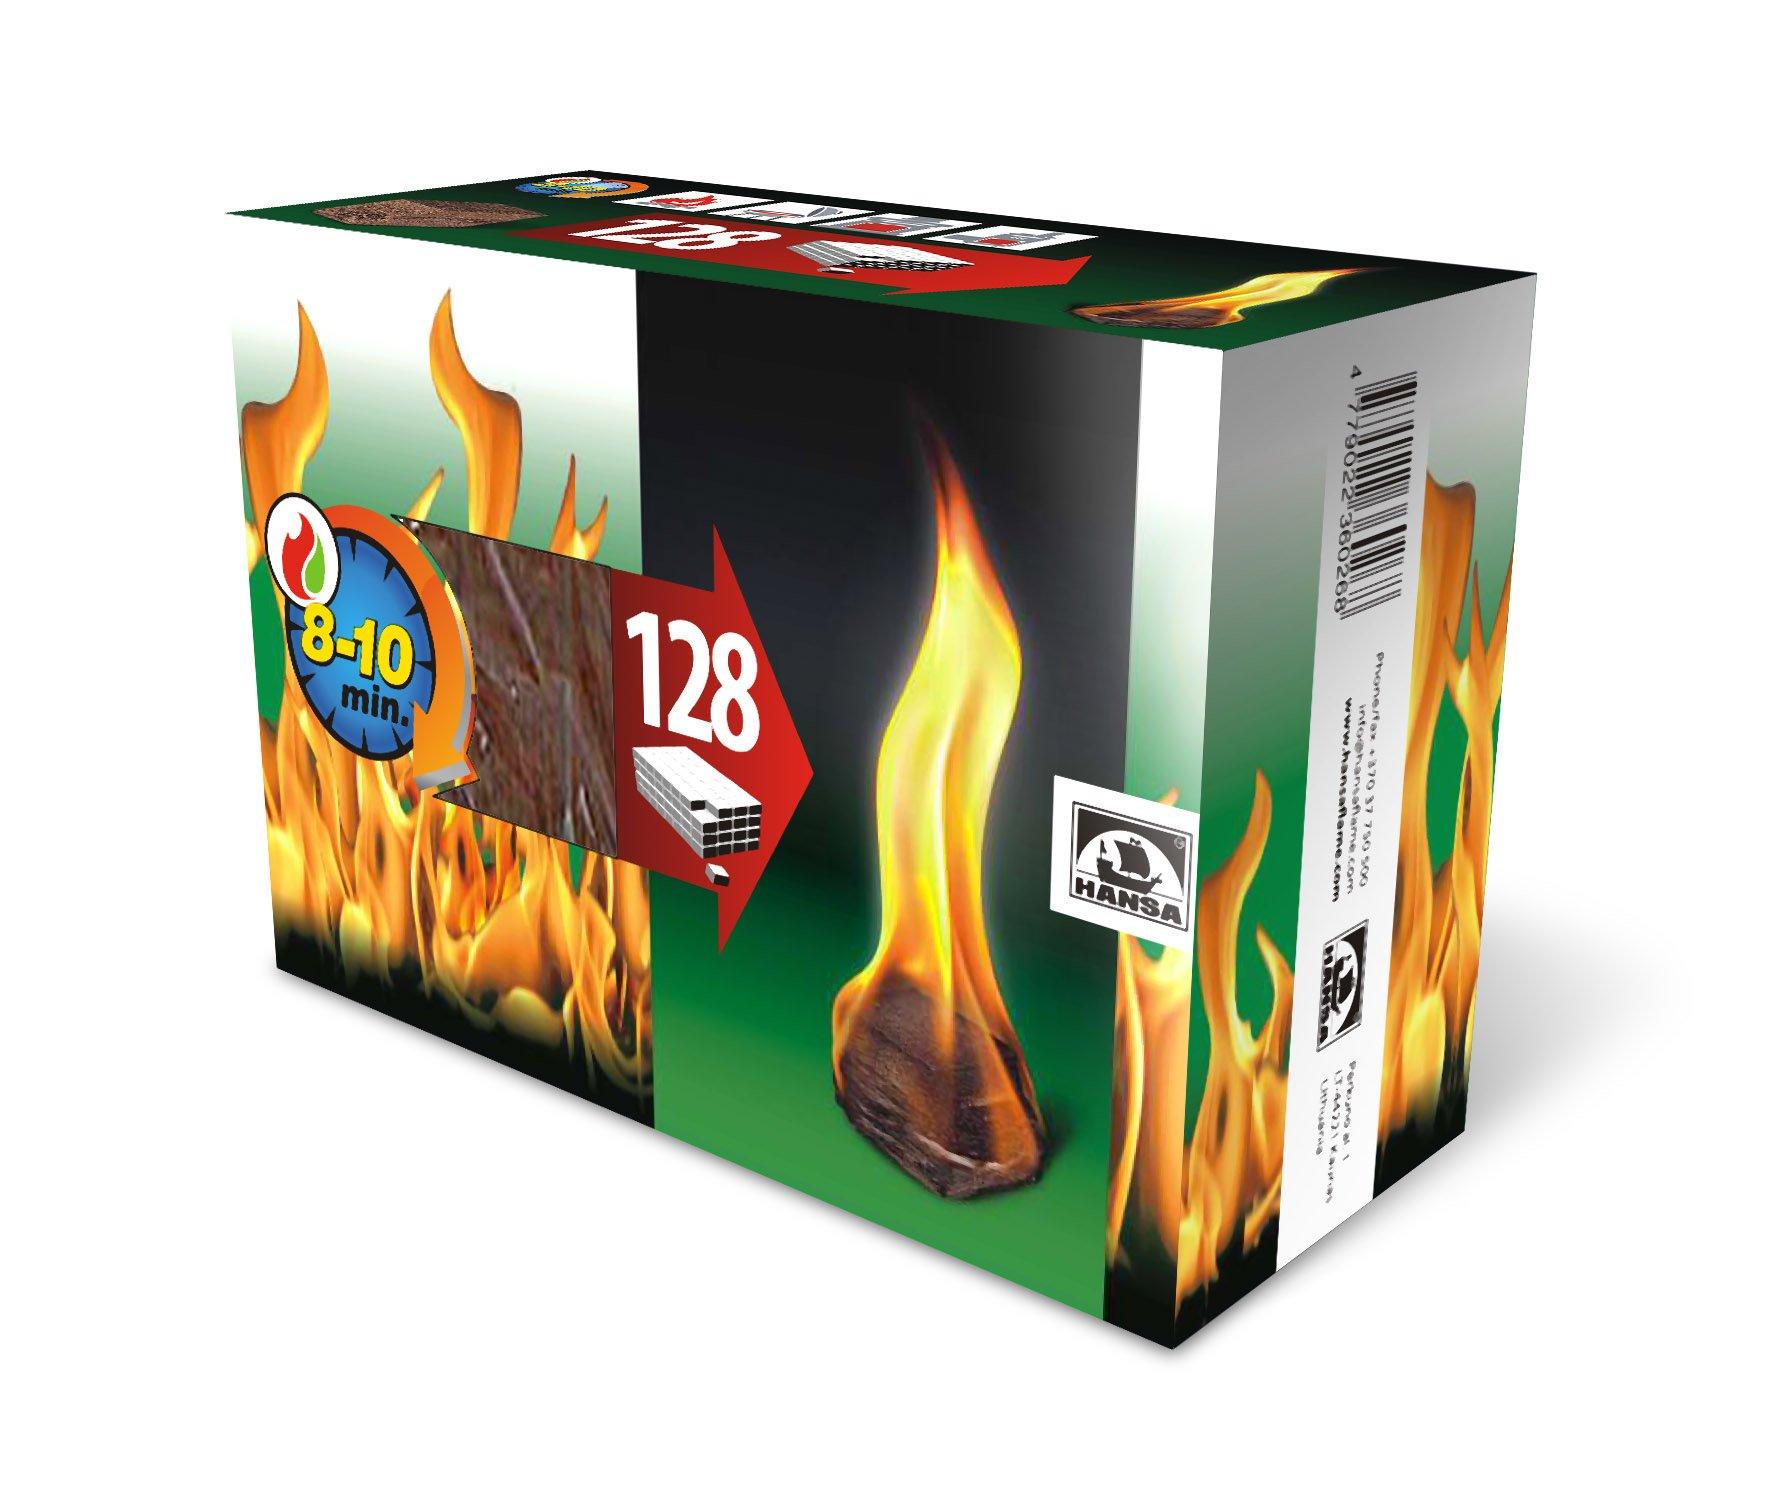 Ugnies įdegtukai HANSA 128 vnt.